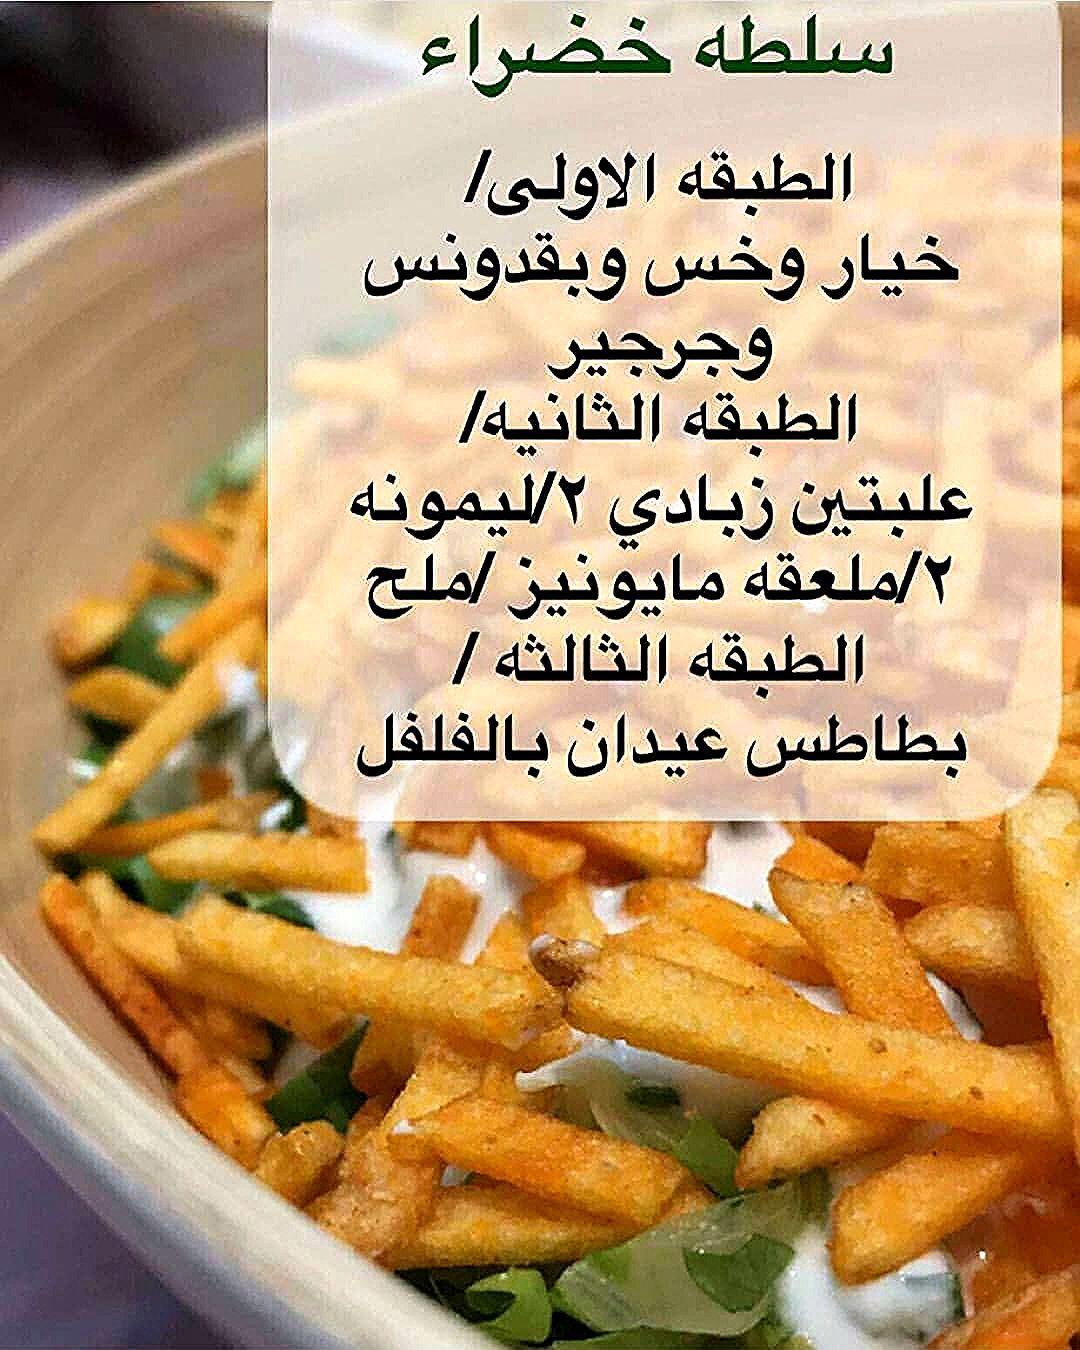 سلطة الخضراء مع عيدان البطاطس والزباديgreen Salad With Potato Sticks Cookout Food Coffee Drink Recipes Food Receipes